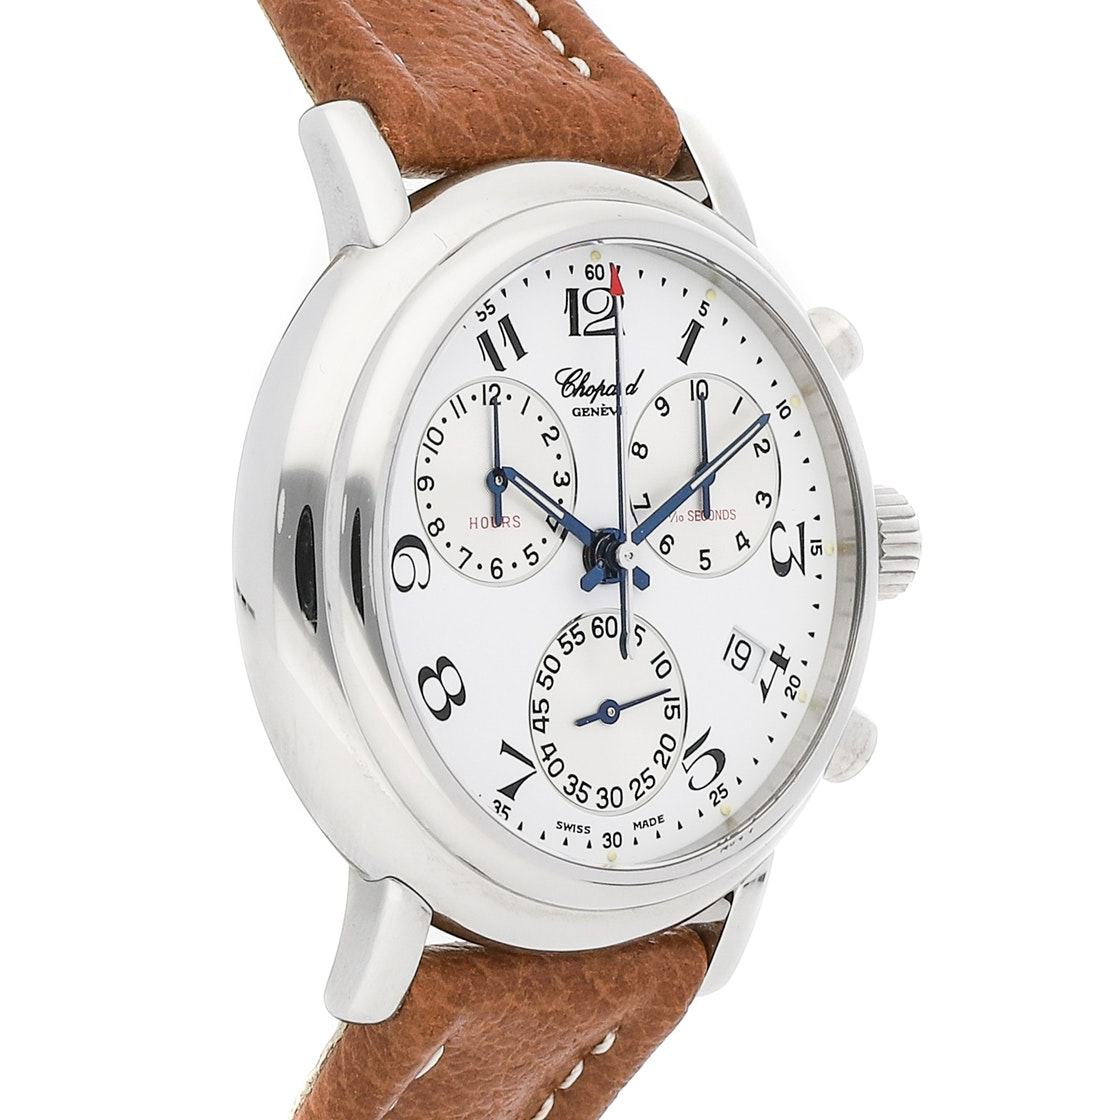 Chopard Mille Miglia Chronograph 16/8271